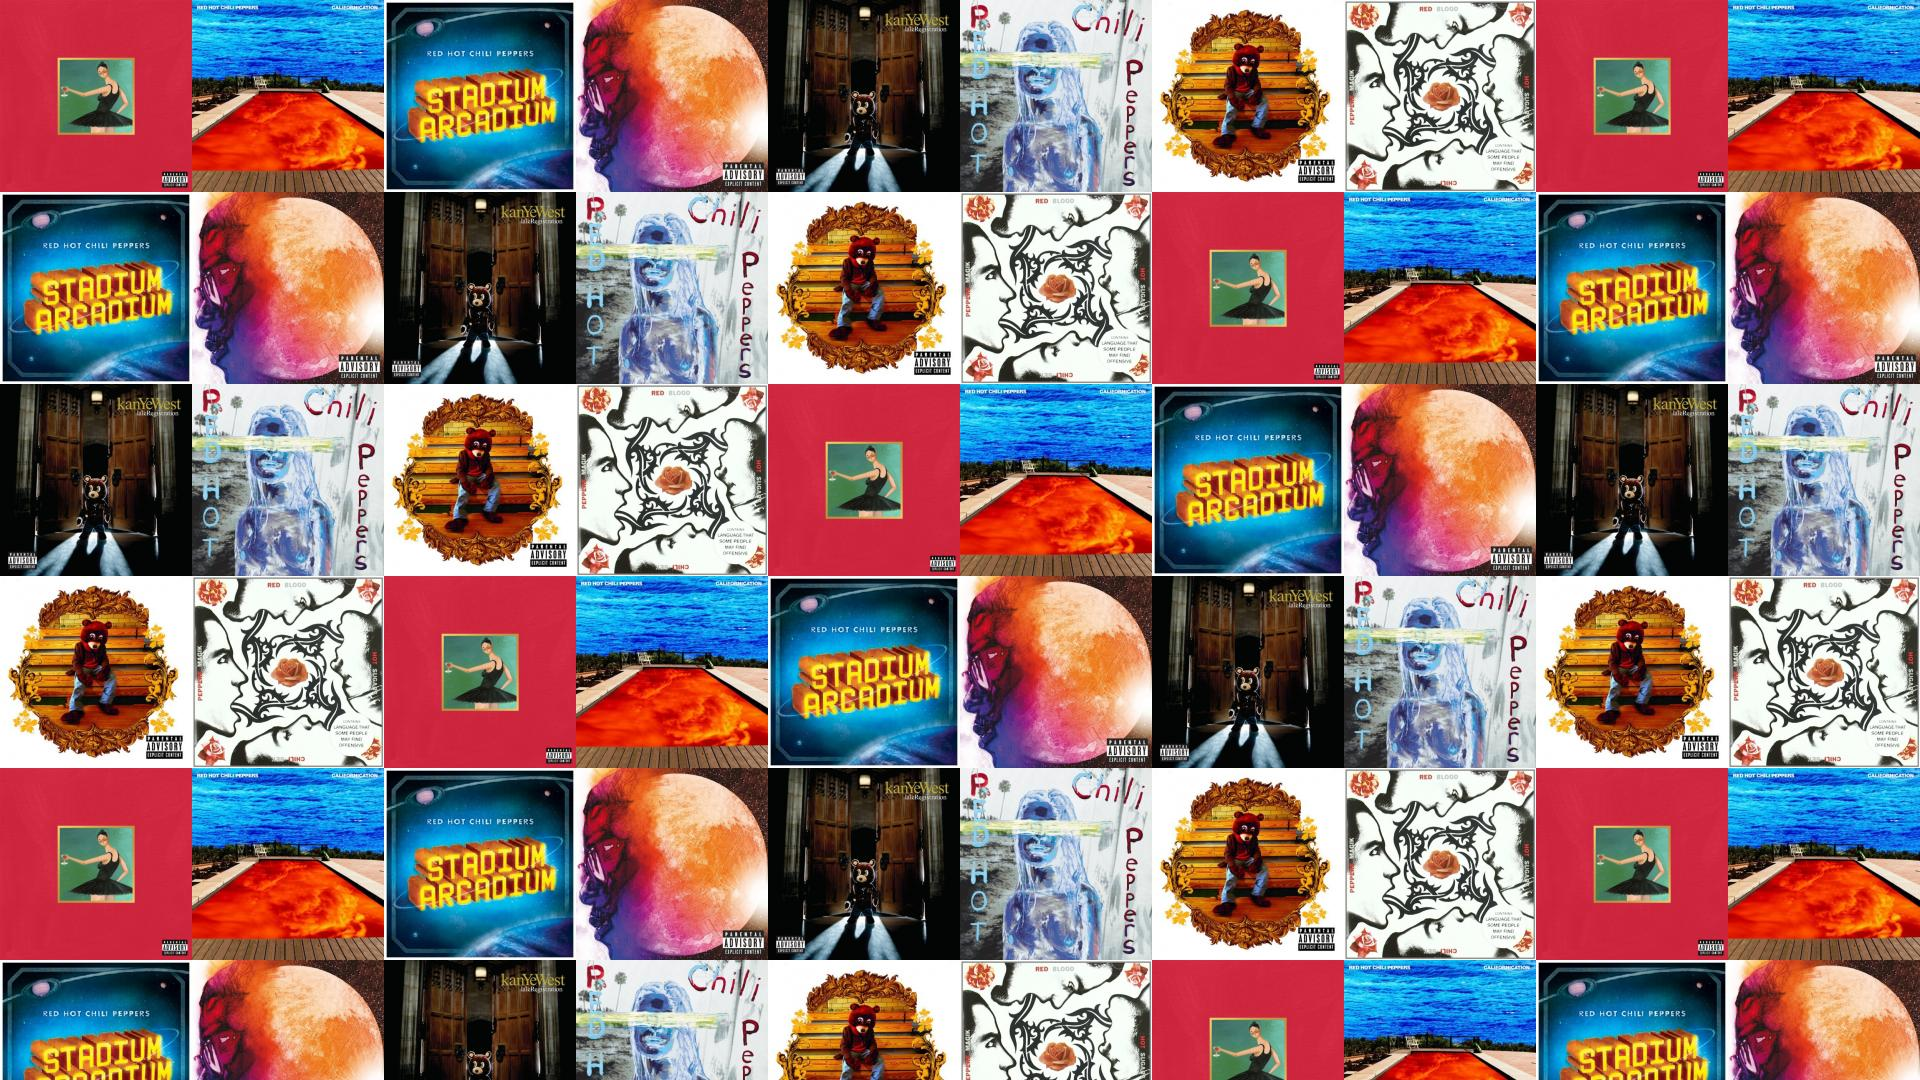 Kanye West My Beautiful Dark Twisted Fantasy Red Wallpaper Tiled Desktop Wallpaper